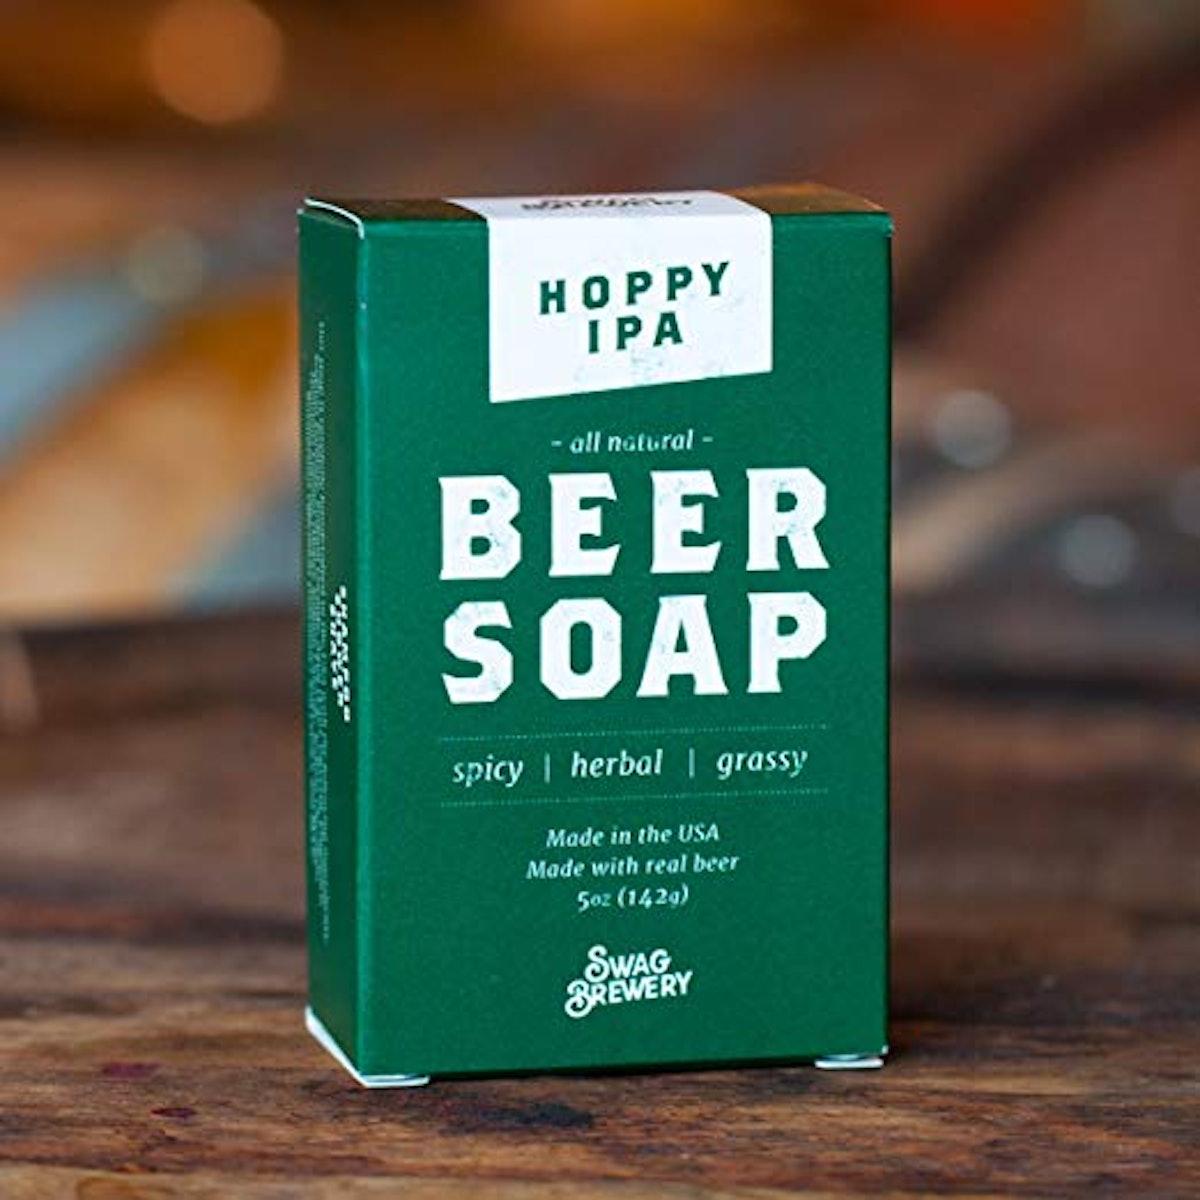 Swag Brewery Hoppy IPA BEER SOAP